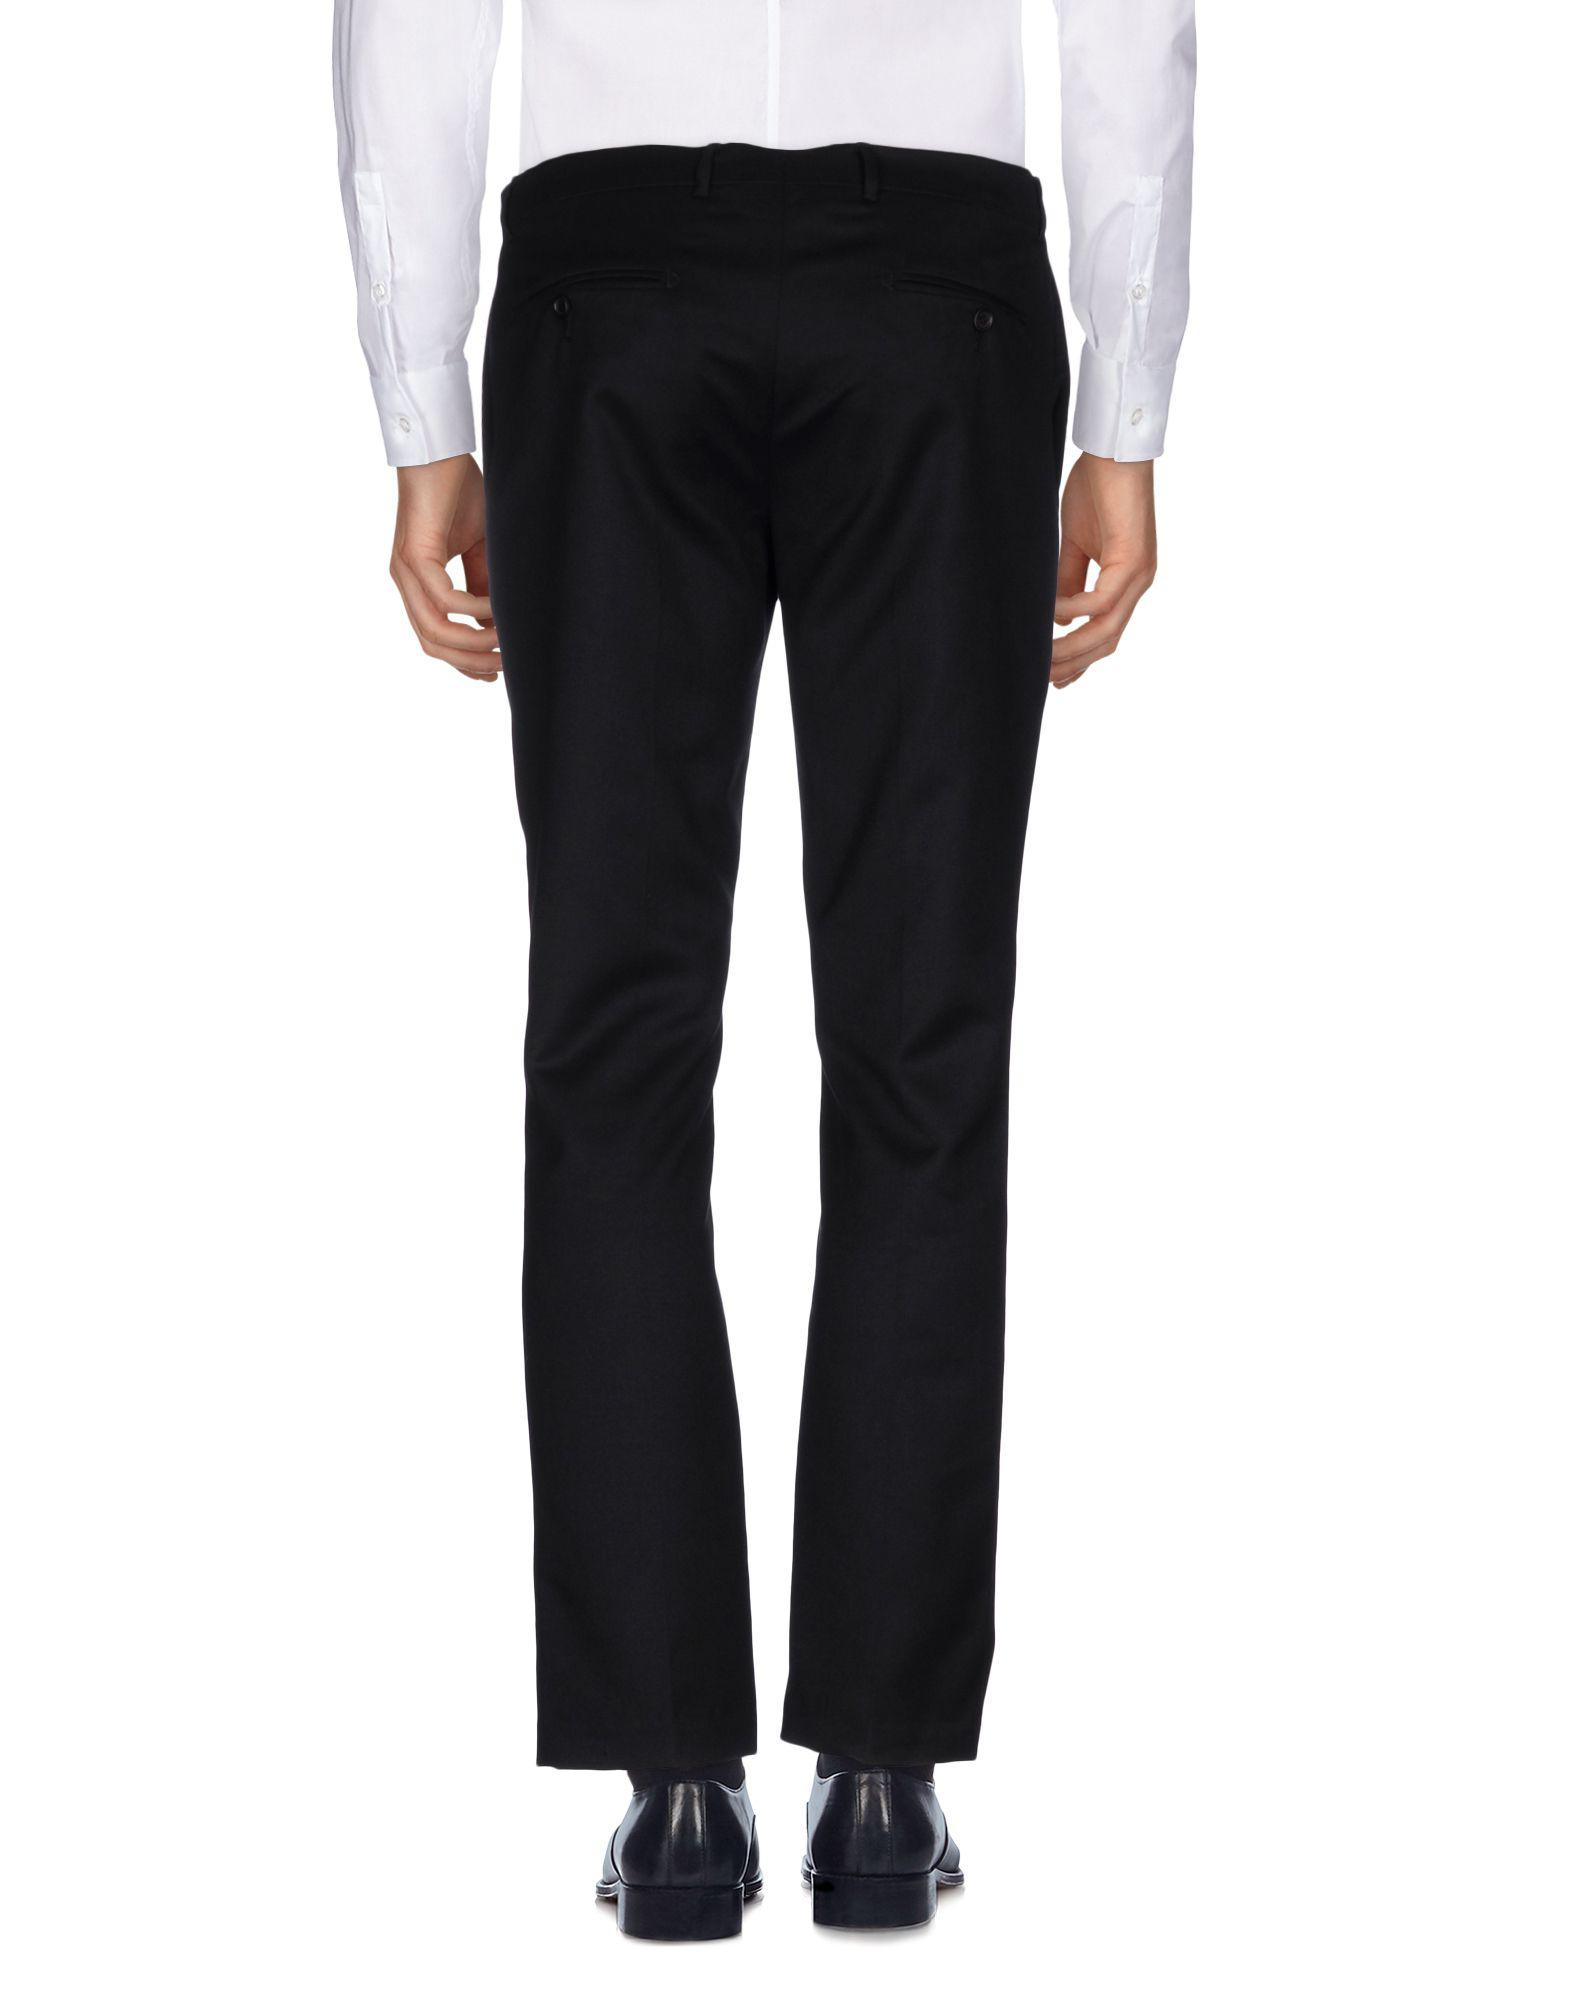 Bolongaro Trevor Flannel Casual Pants in Black for Men